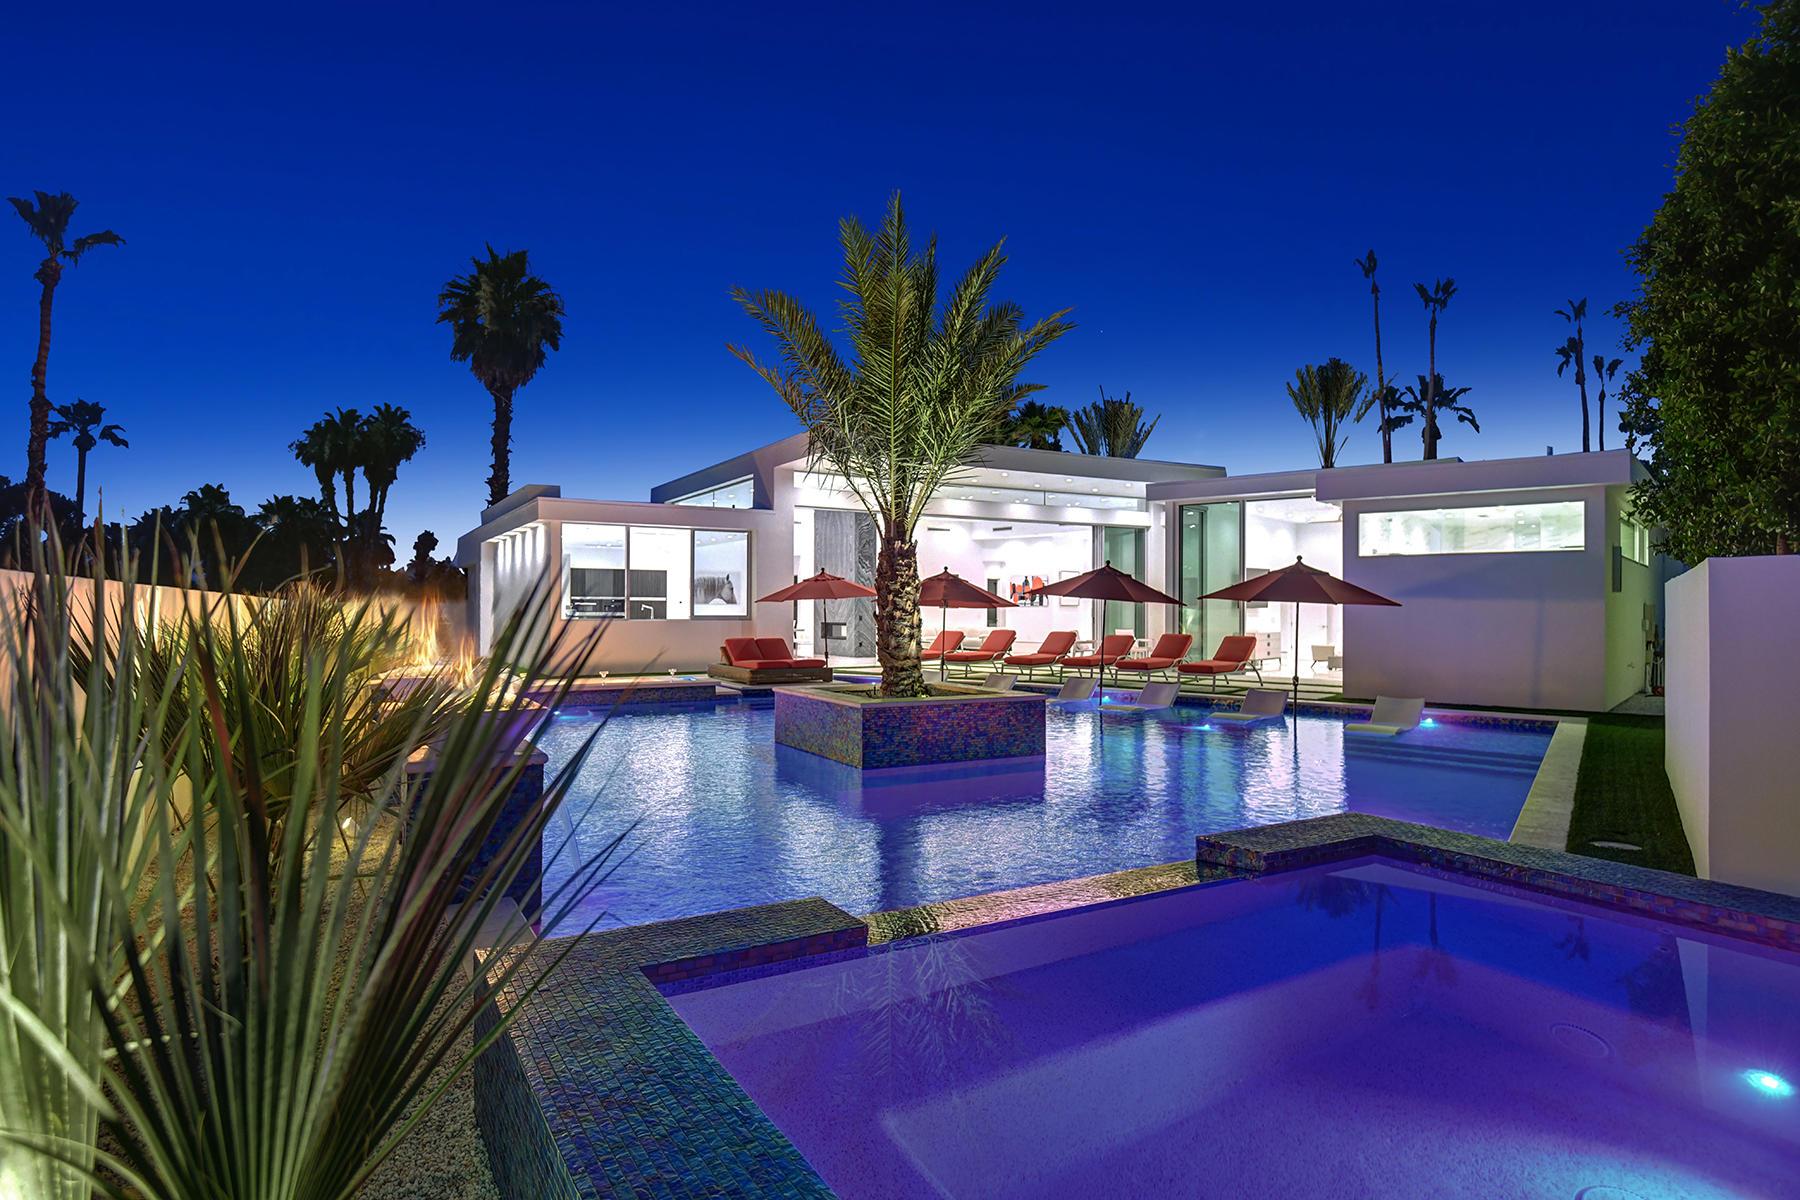 Photo of 350 W El Portal, Palm Springs, CA 92264